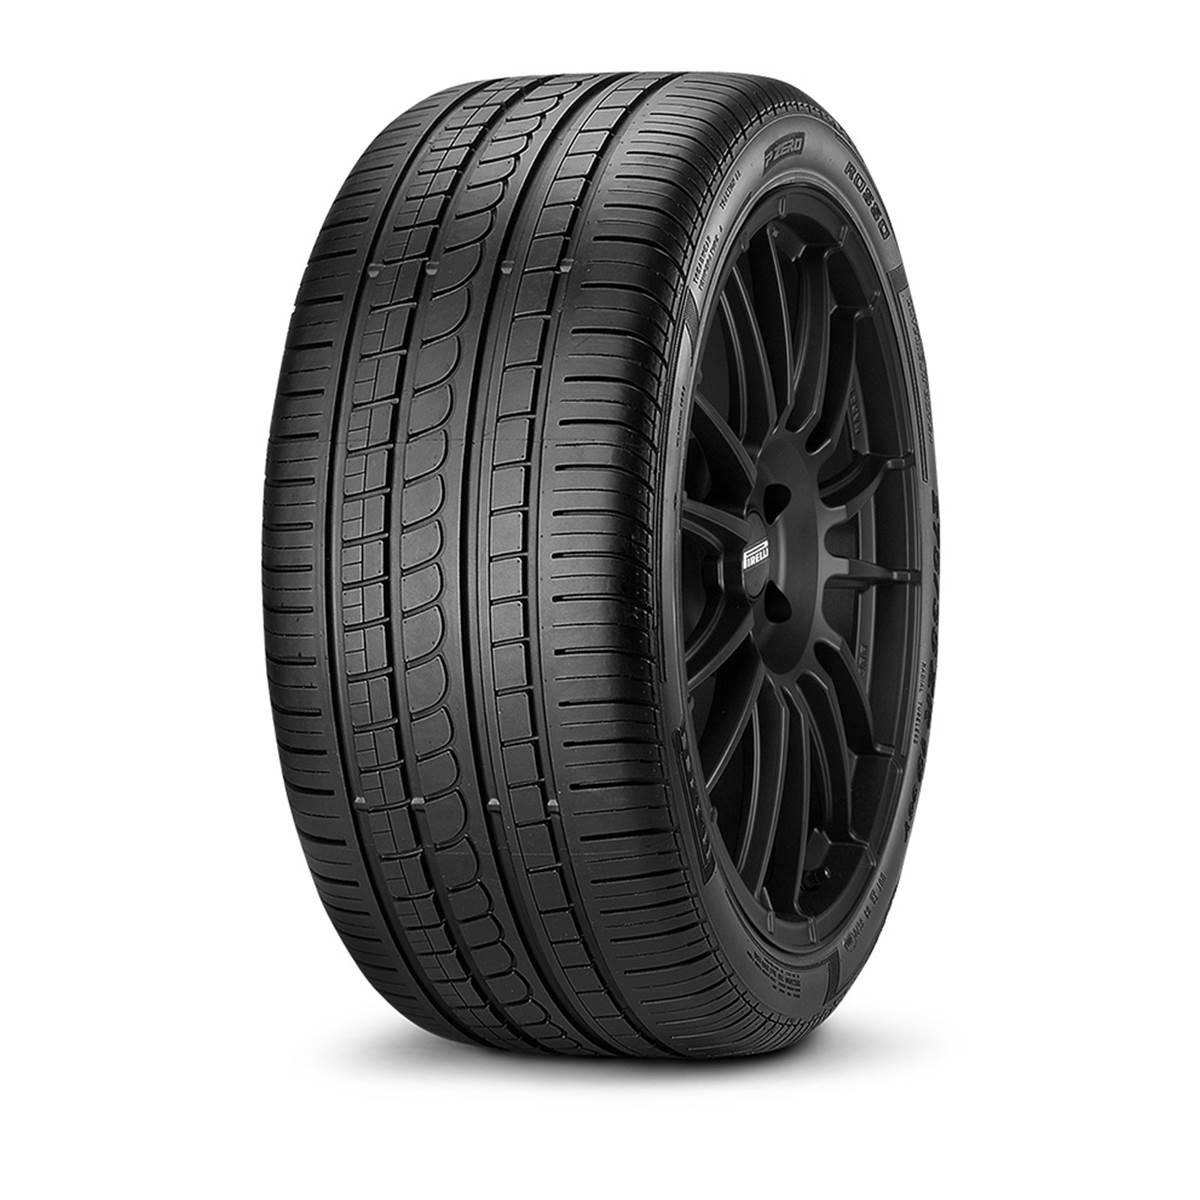 Pneu Pirelli 245/35R19 93Y Pzero Nero (Gt) XL